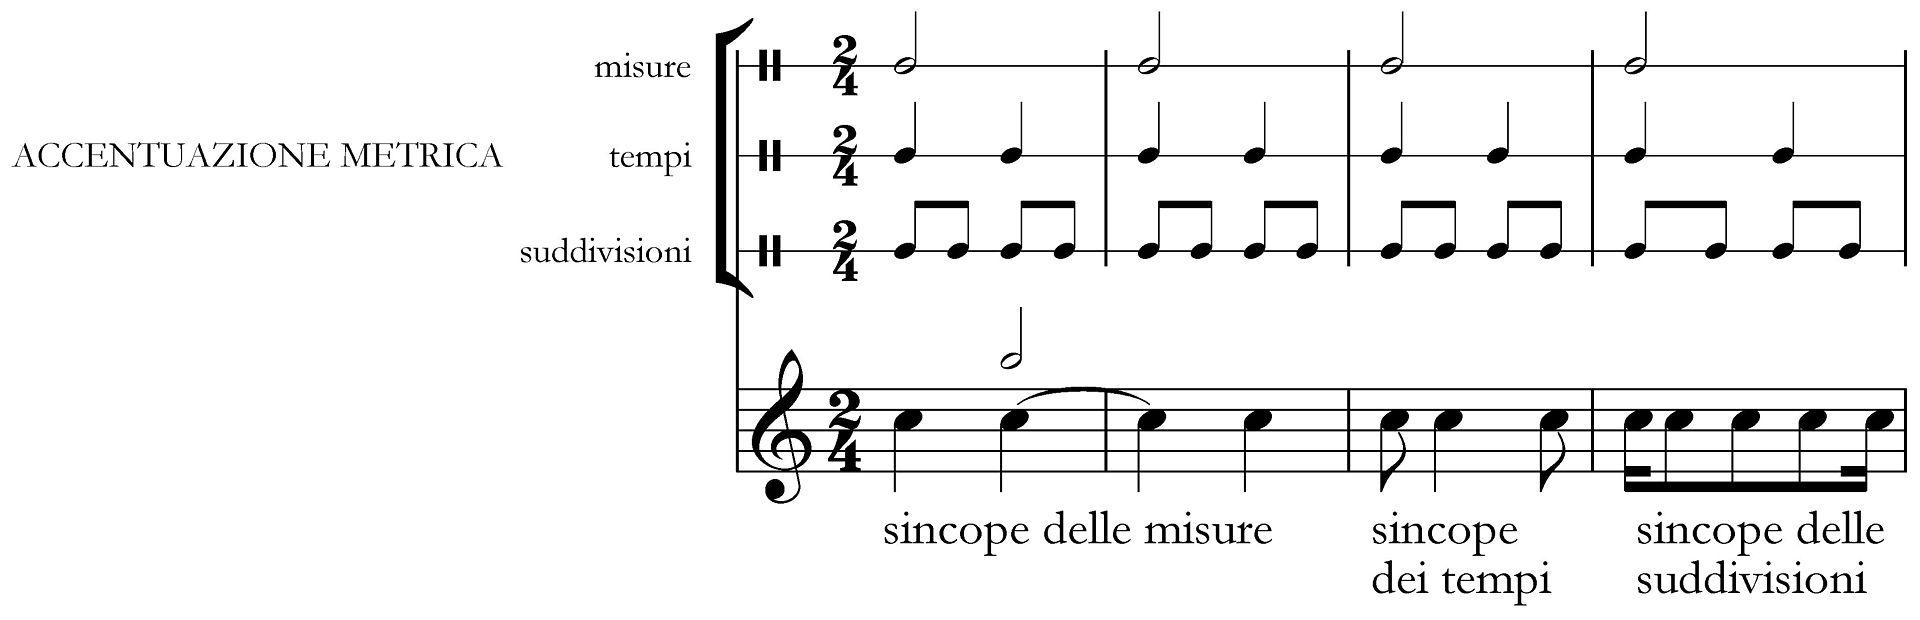 Vari_tipi_di_sincope